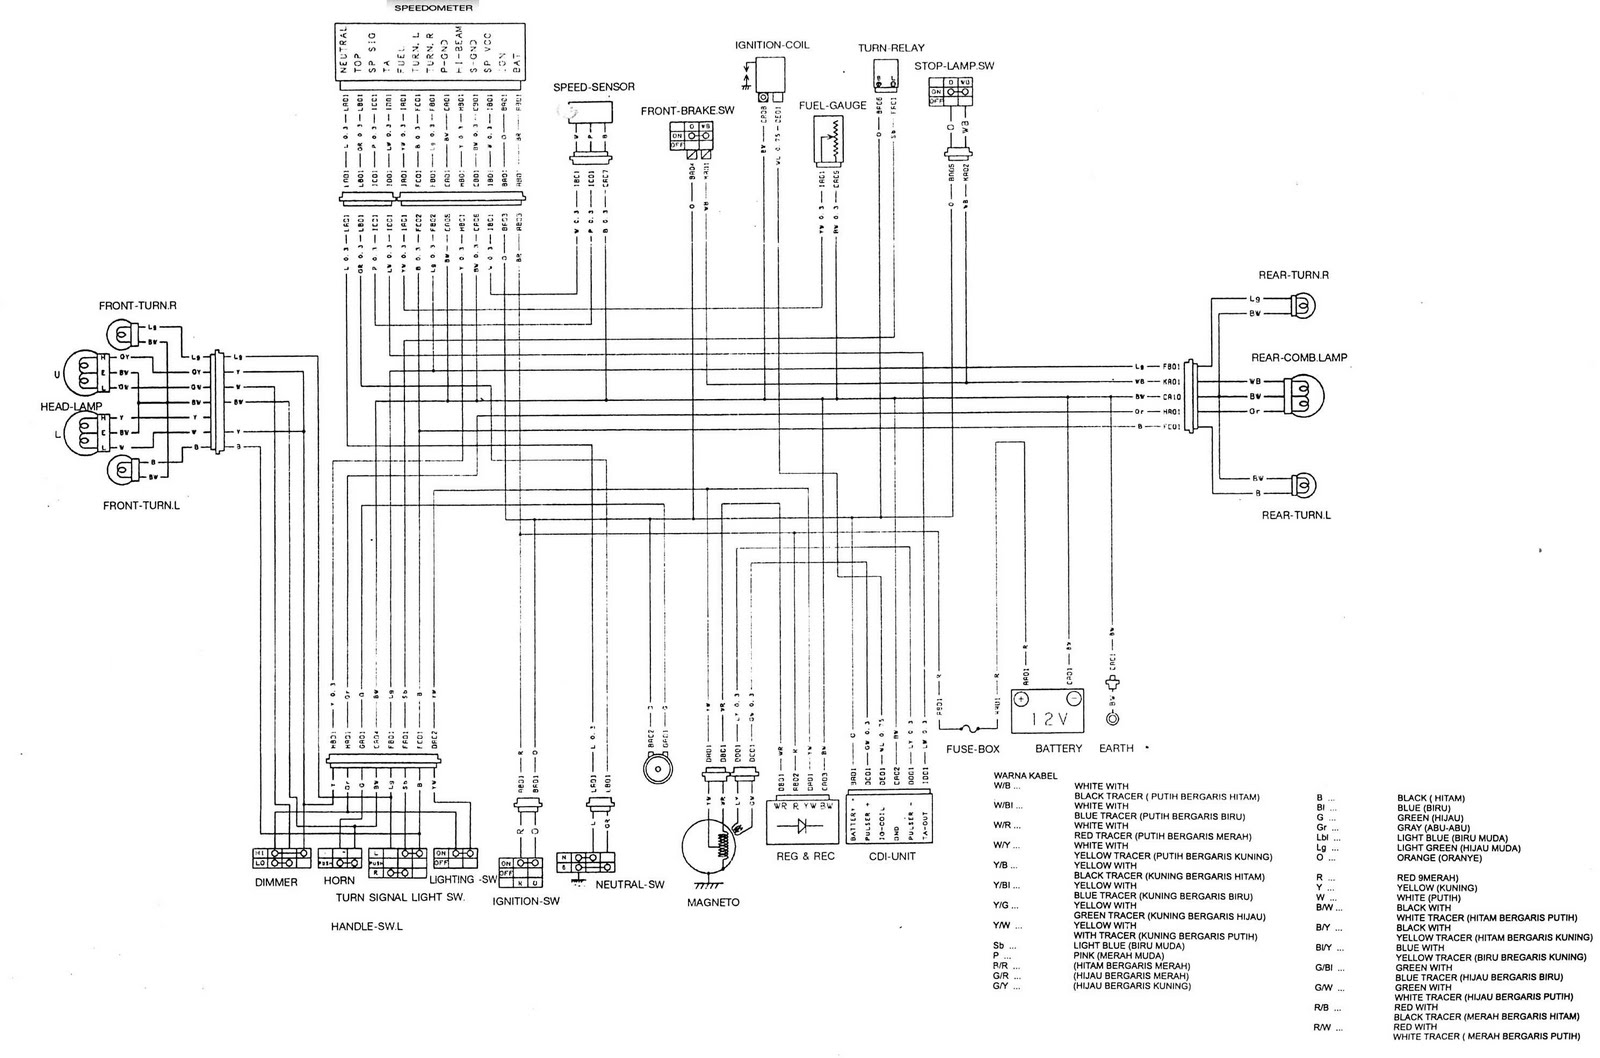 hight resolution of wrg 8908 motofino wiring diagramverucci wiring diagram verucci free engine image for verucci luggage verucci